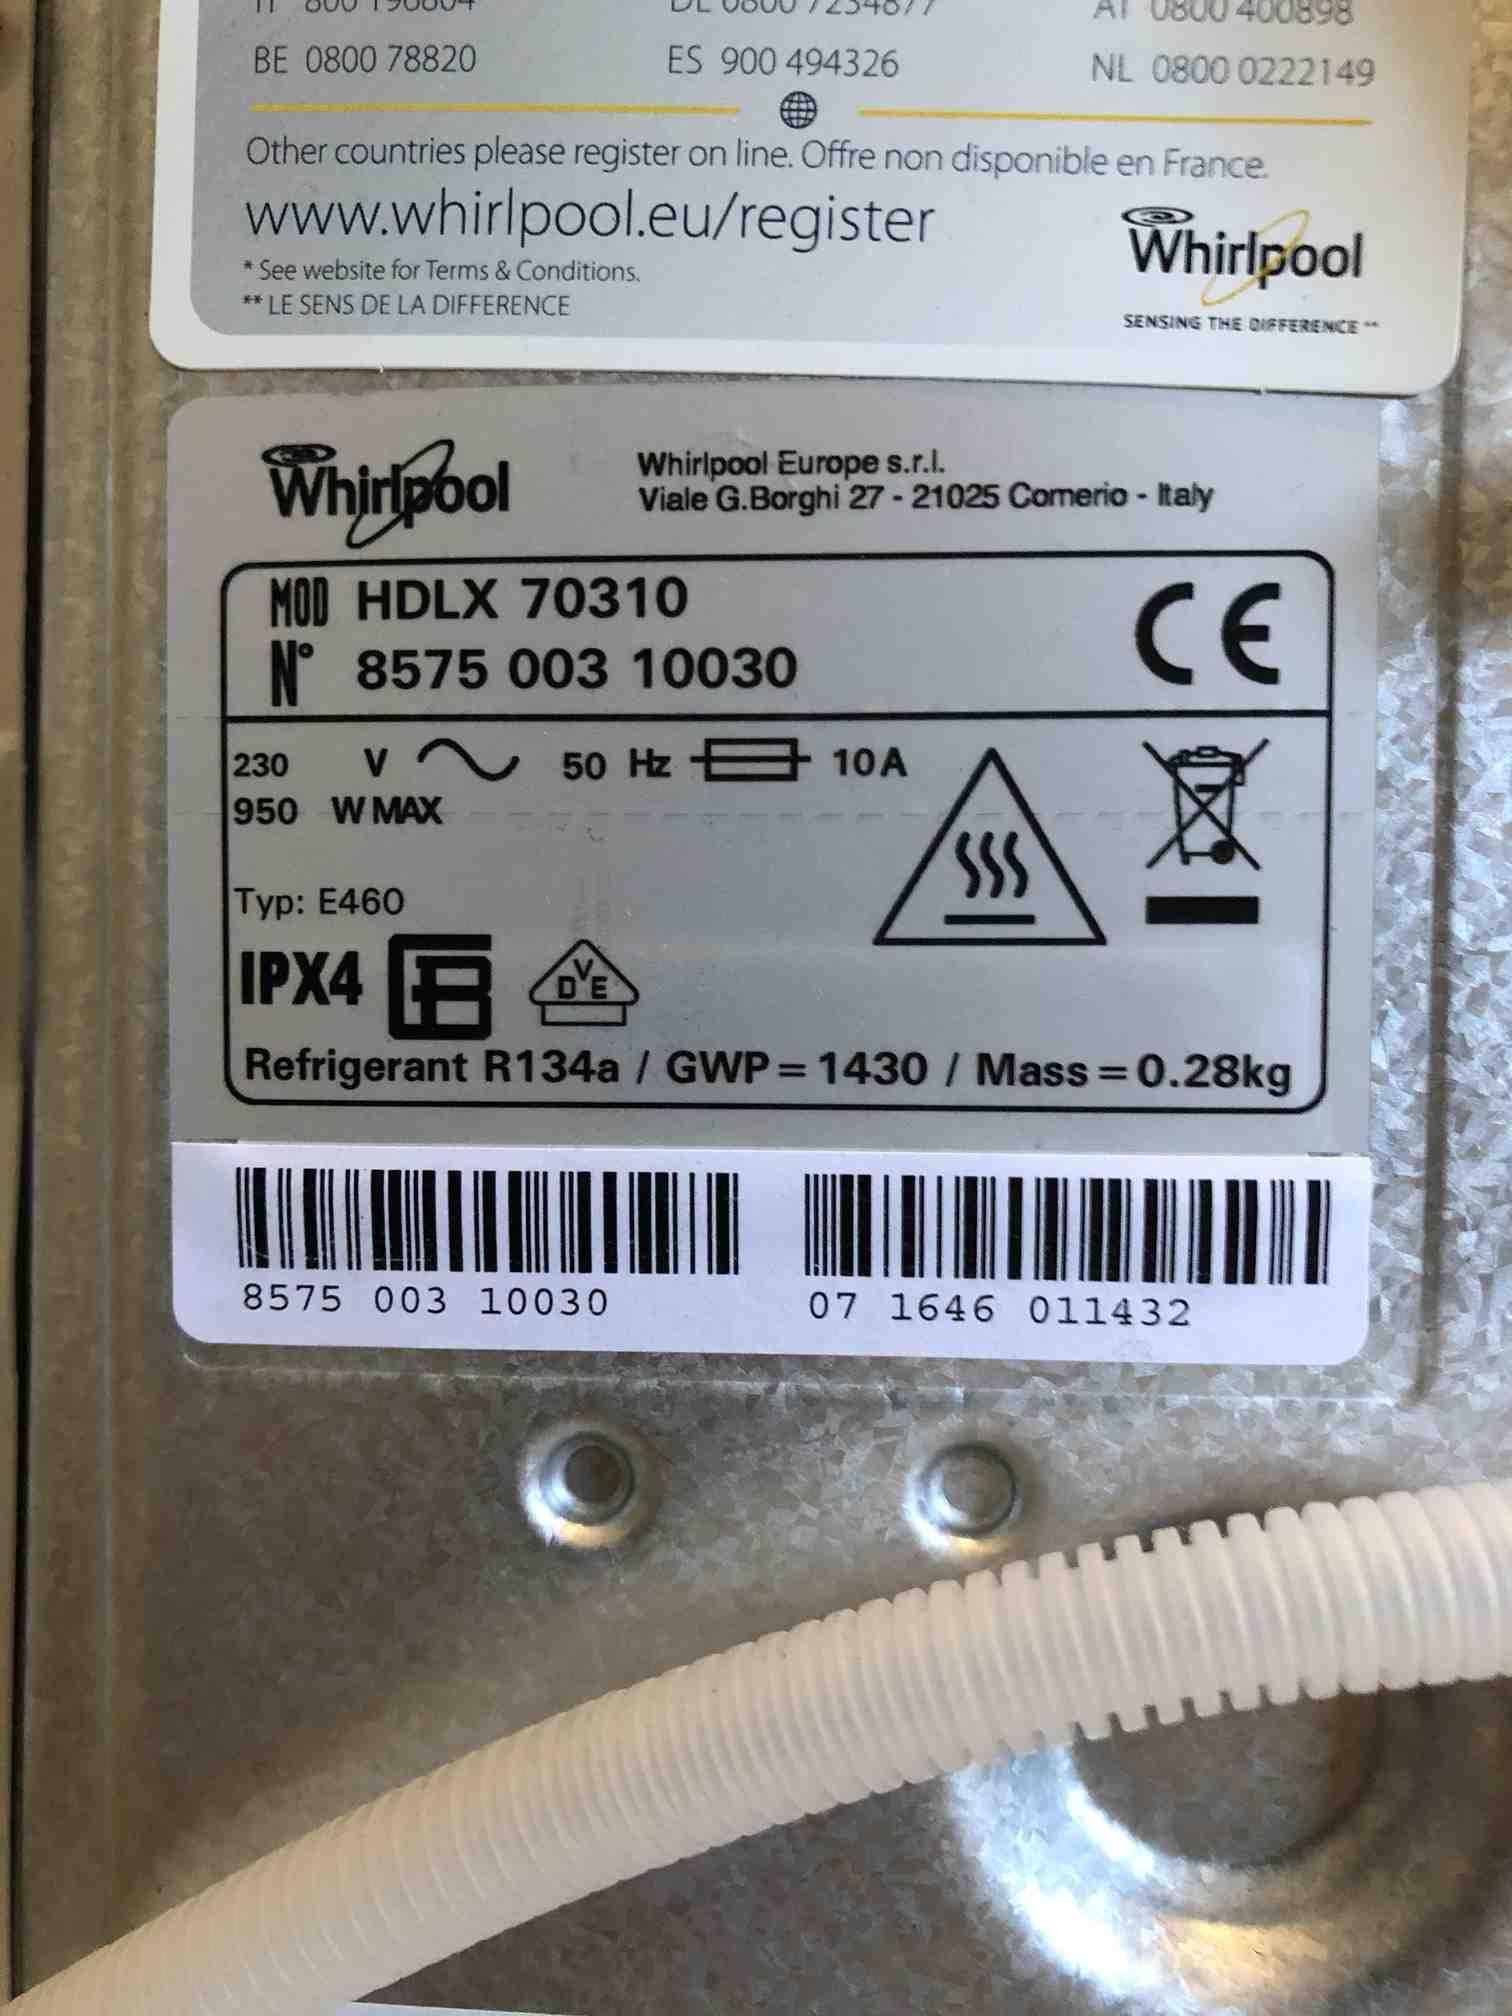 Whirpool HDLX 70310 typeplaatje